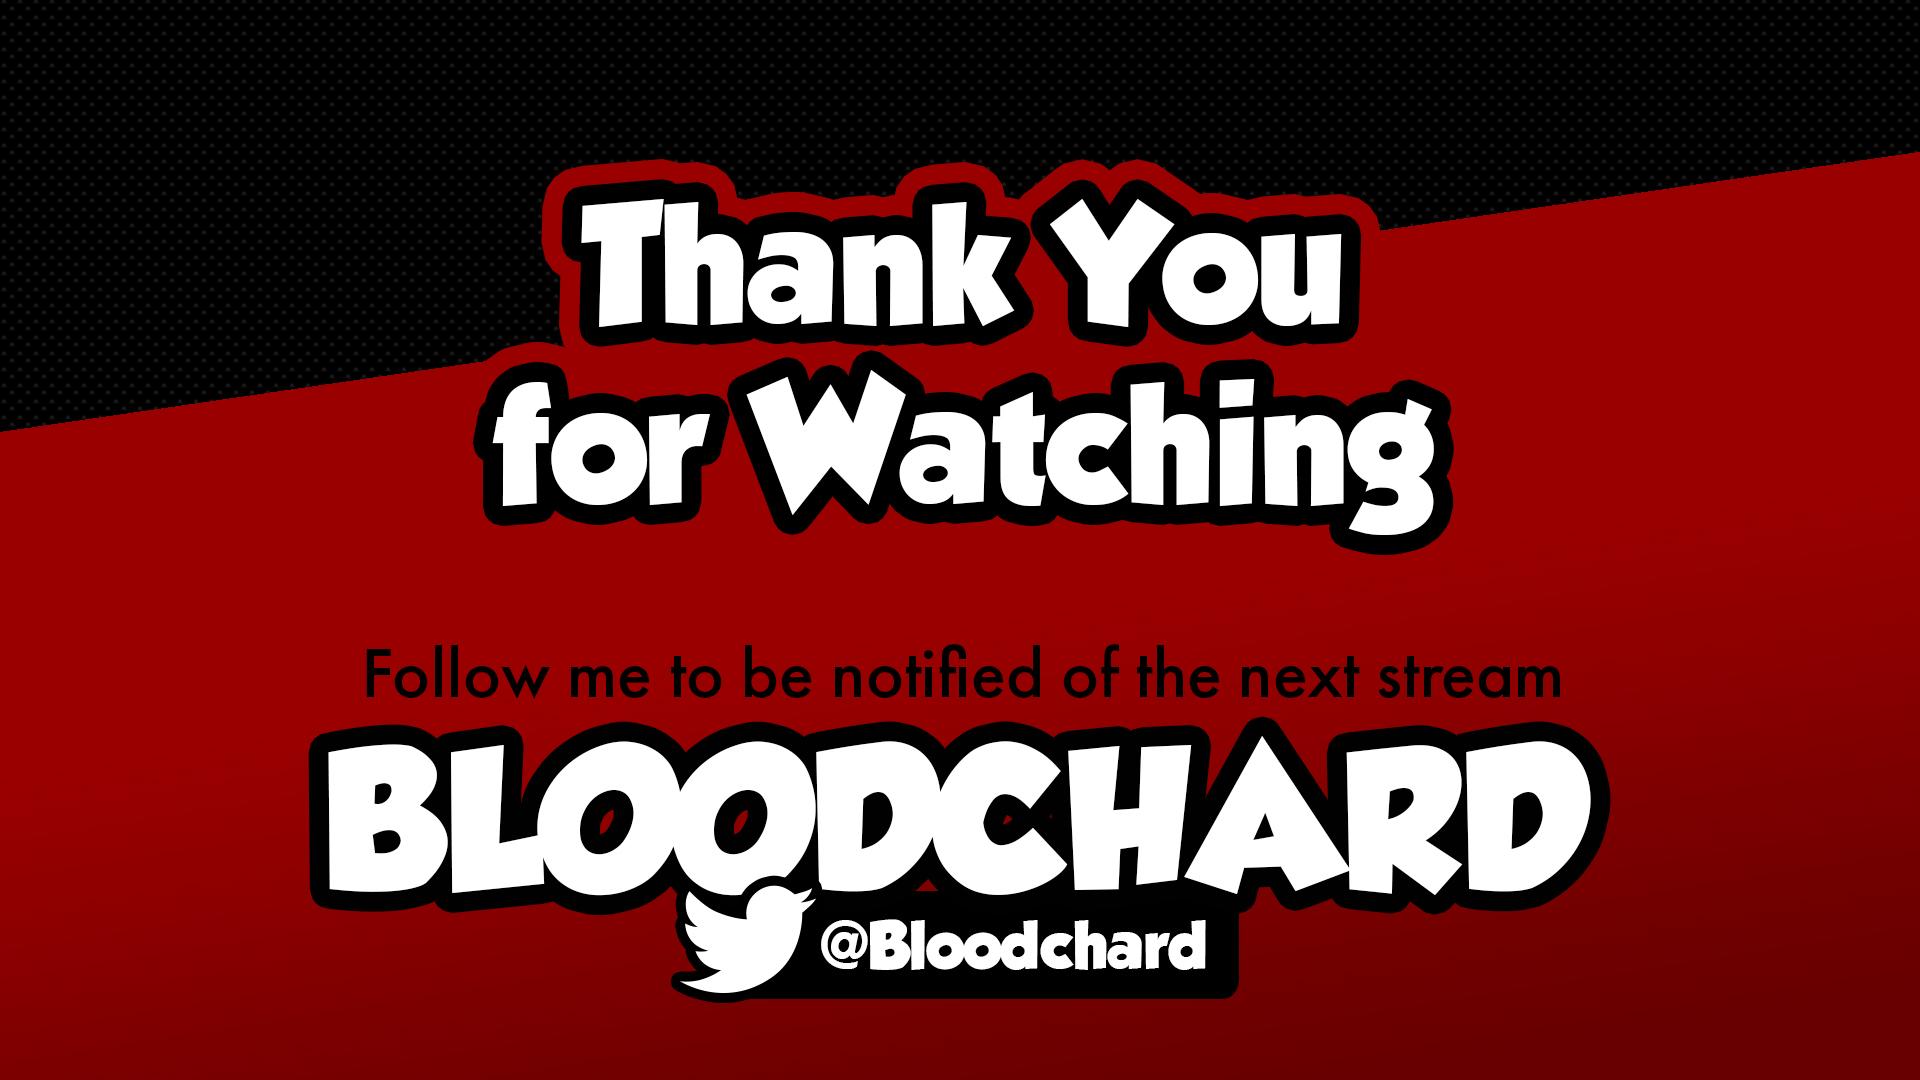 Bloodchard - Thanks